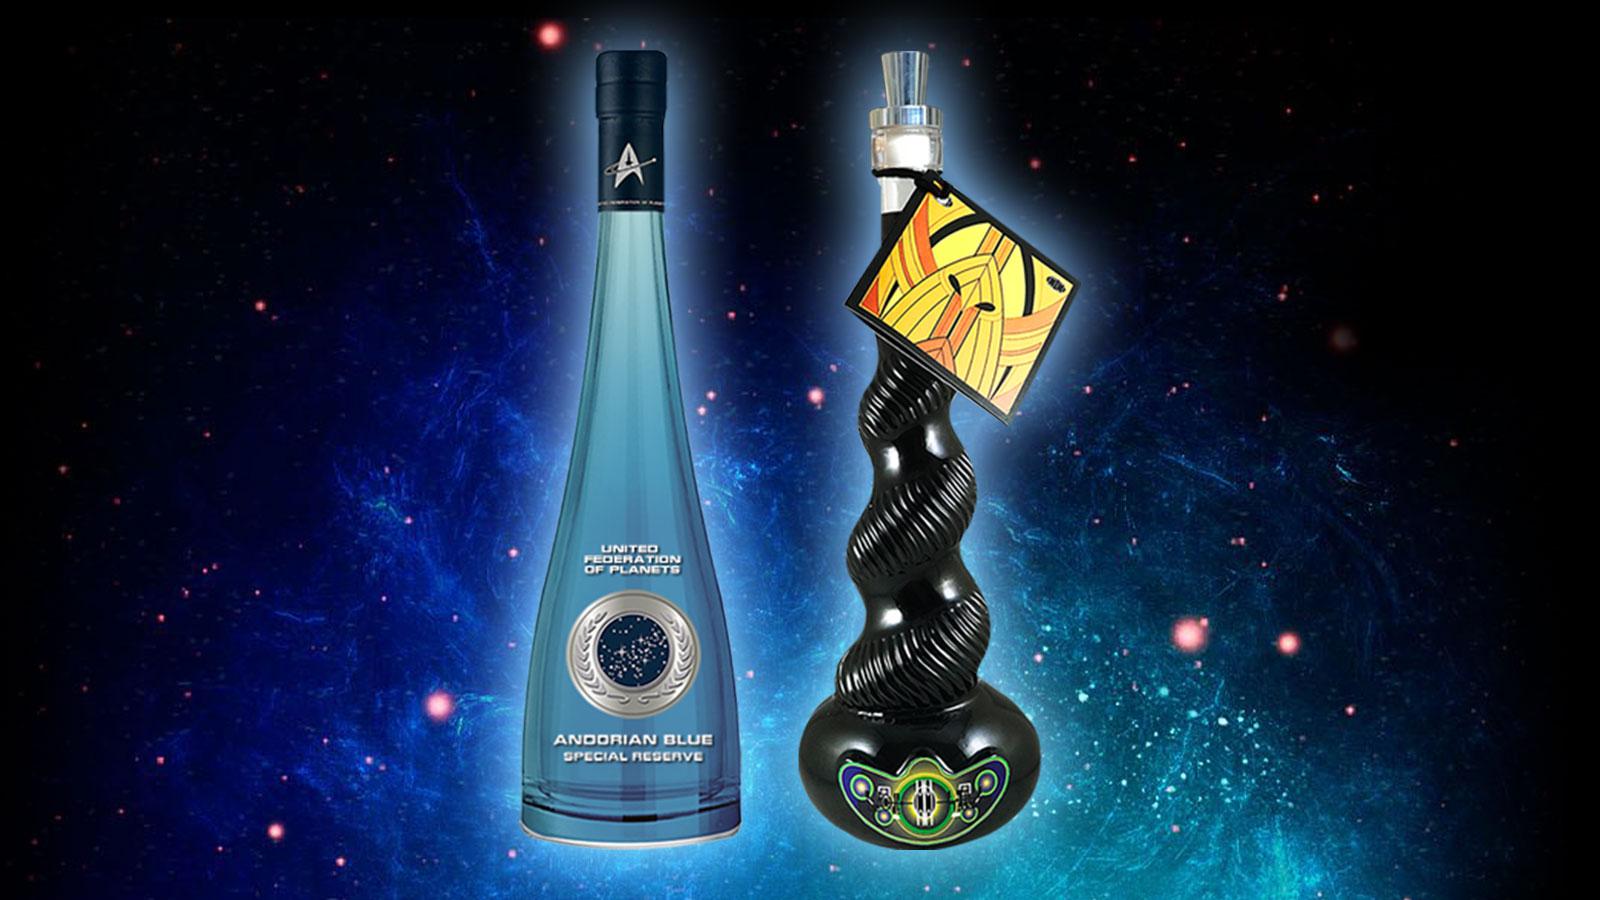 Star Trek Wines Announces Andorian Blue Chardonnay And Cardassian Kanar, Shipping In November